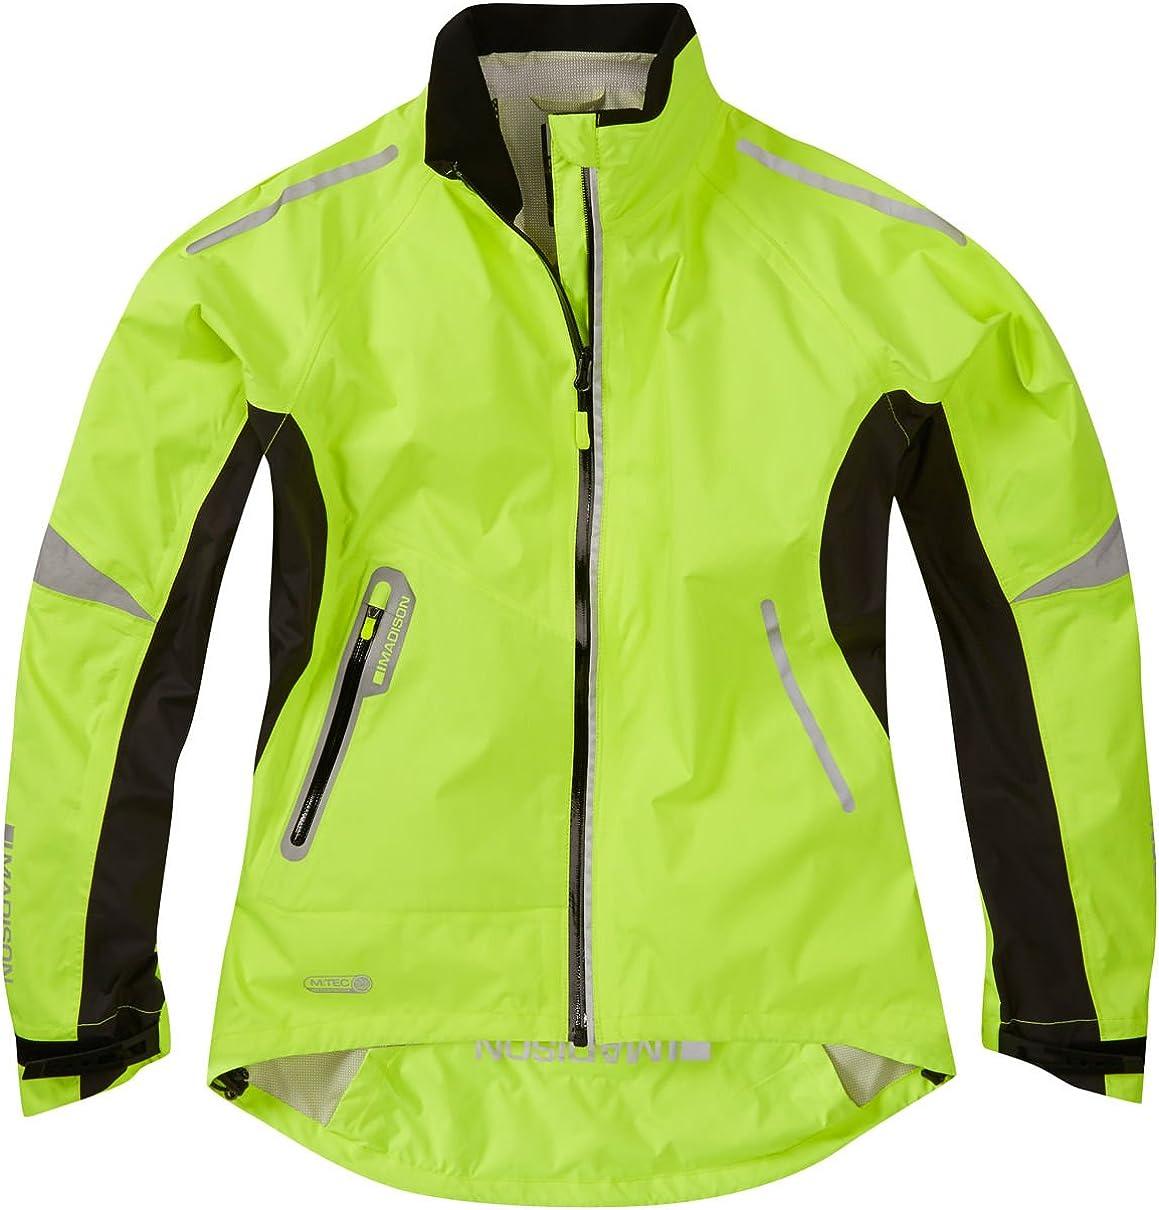 Madison Stellar Ladies Waterproof Cycling Jacket